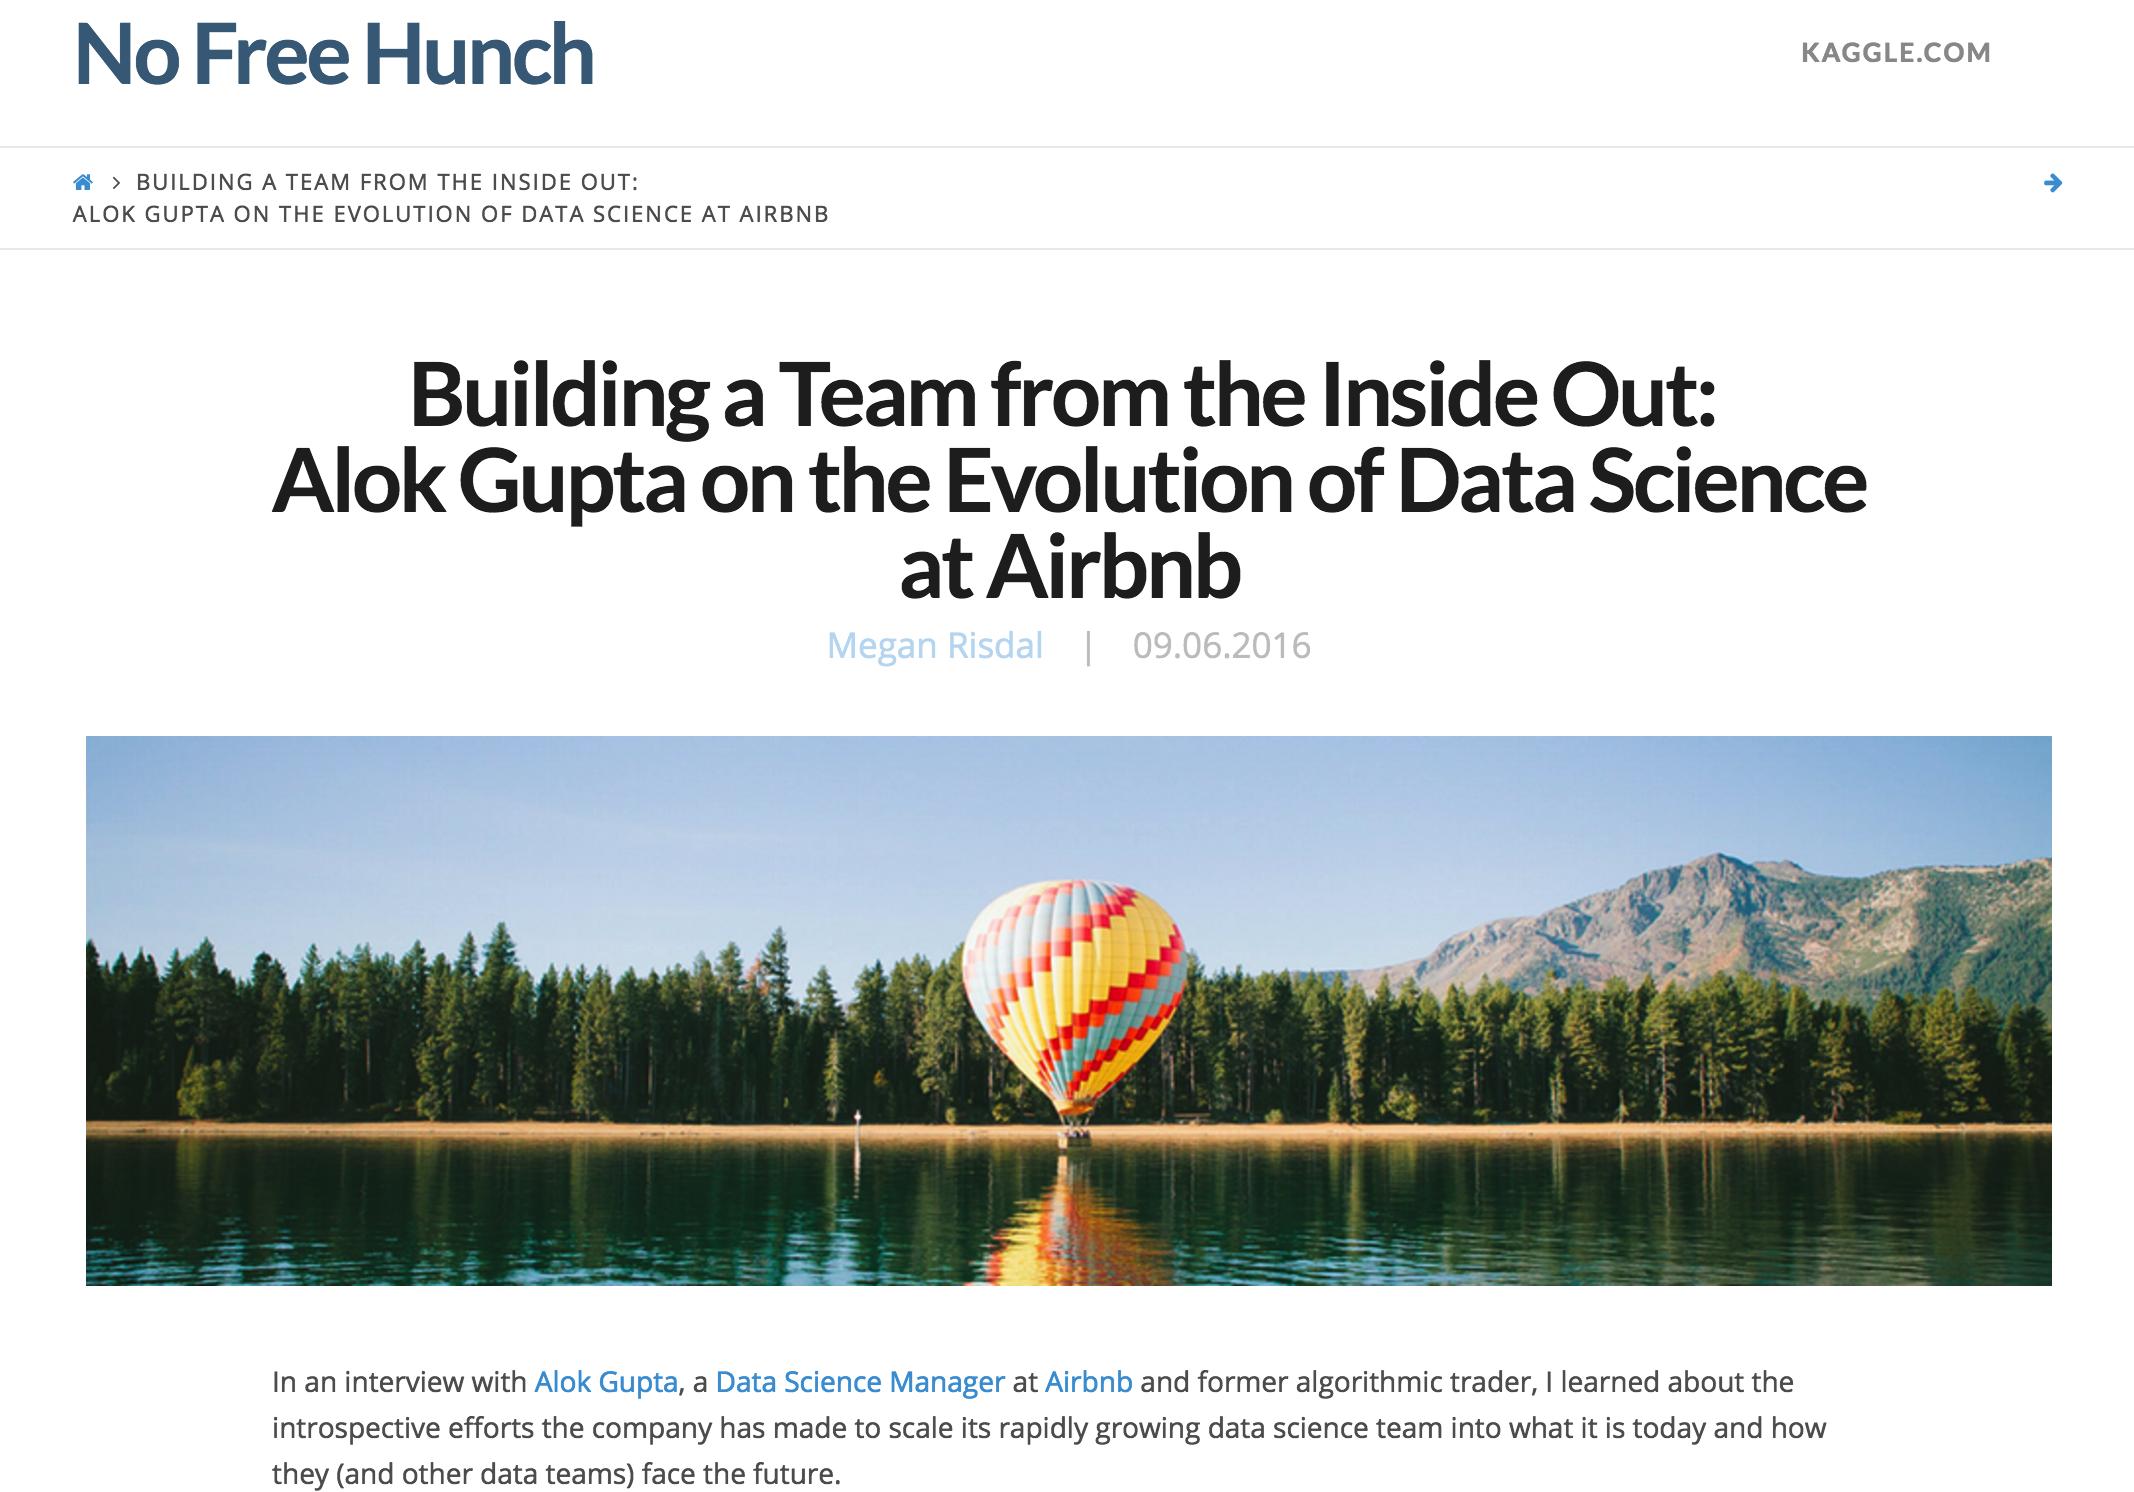 Kaggle interviewed me on Data Science at Airbnb | Alok Gupta